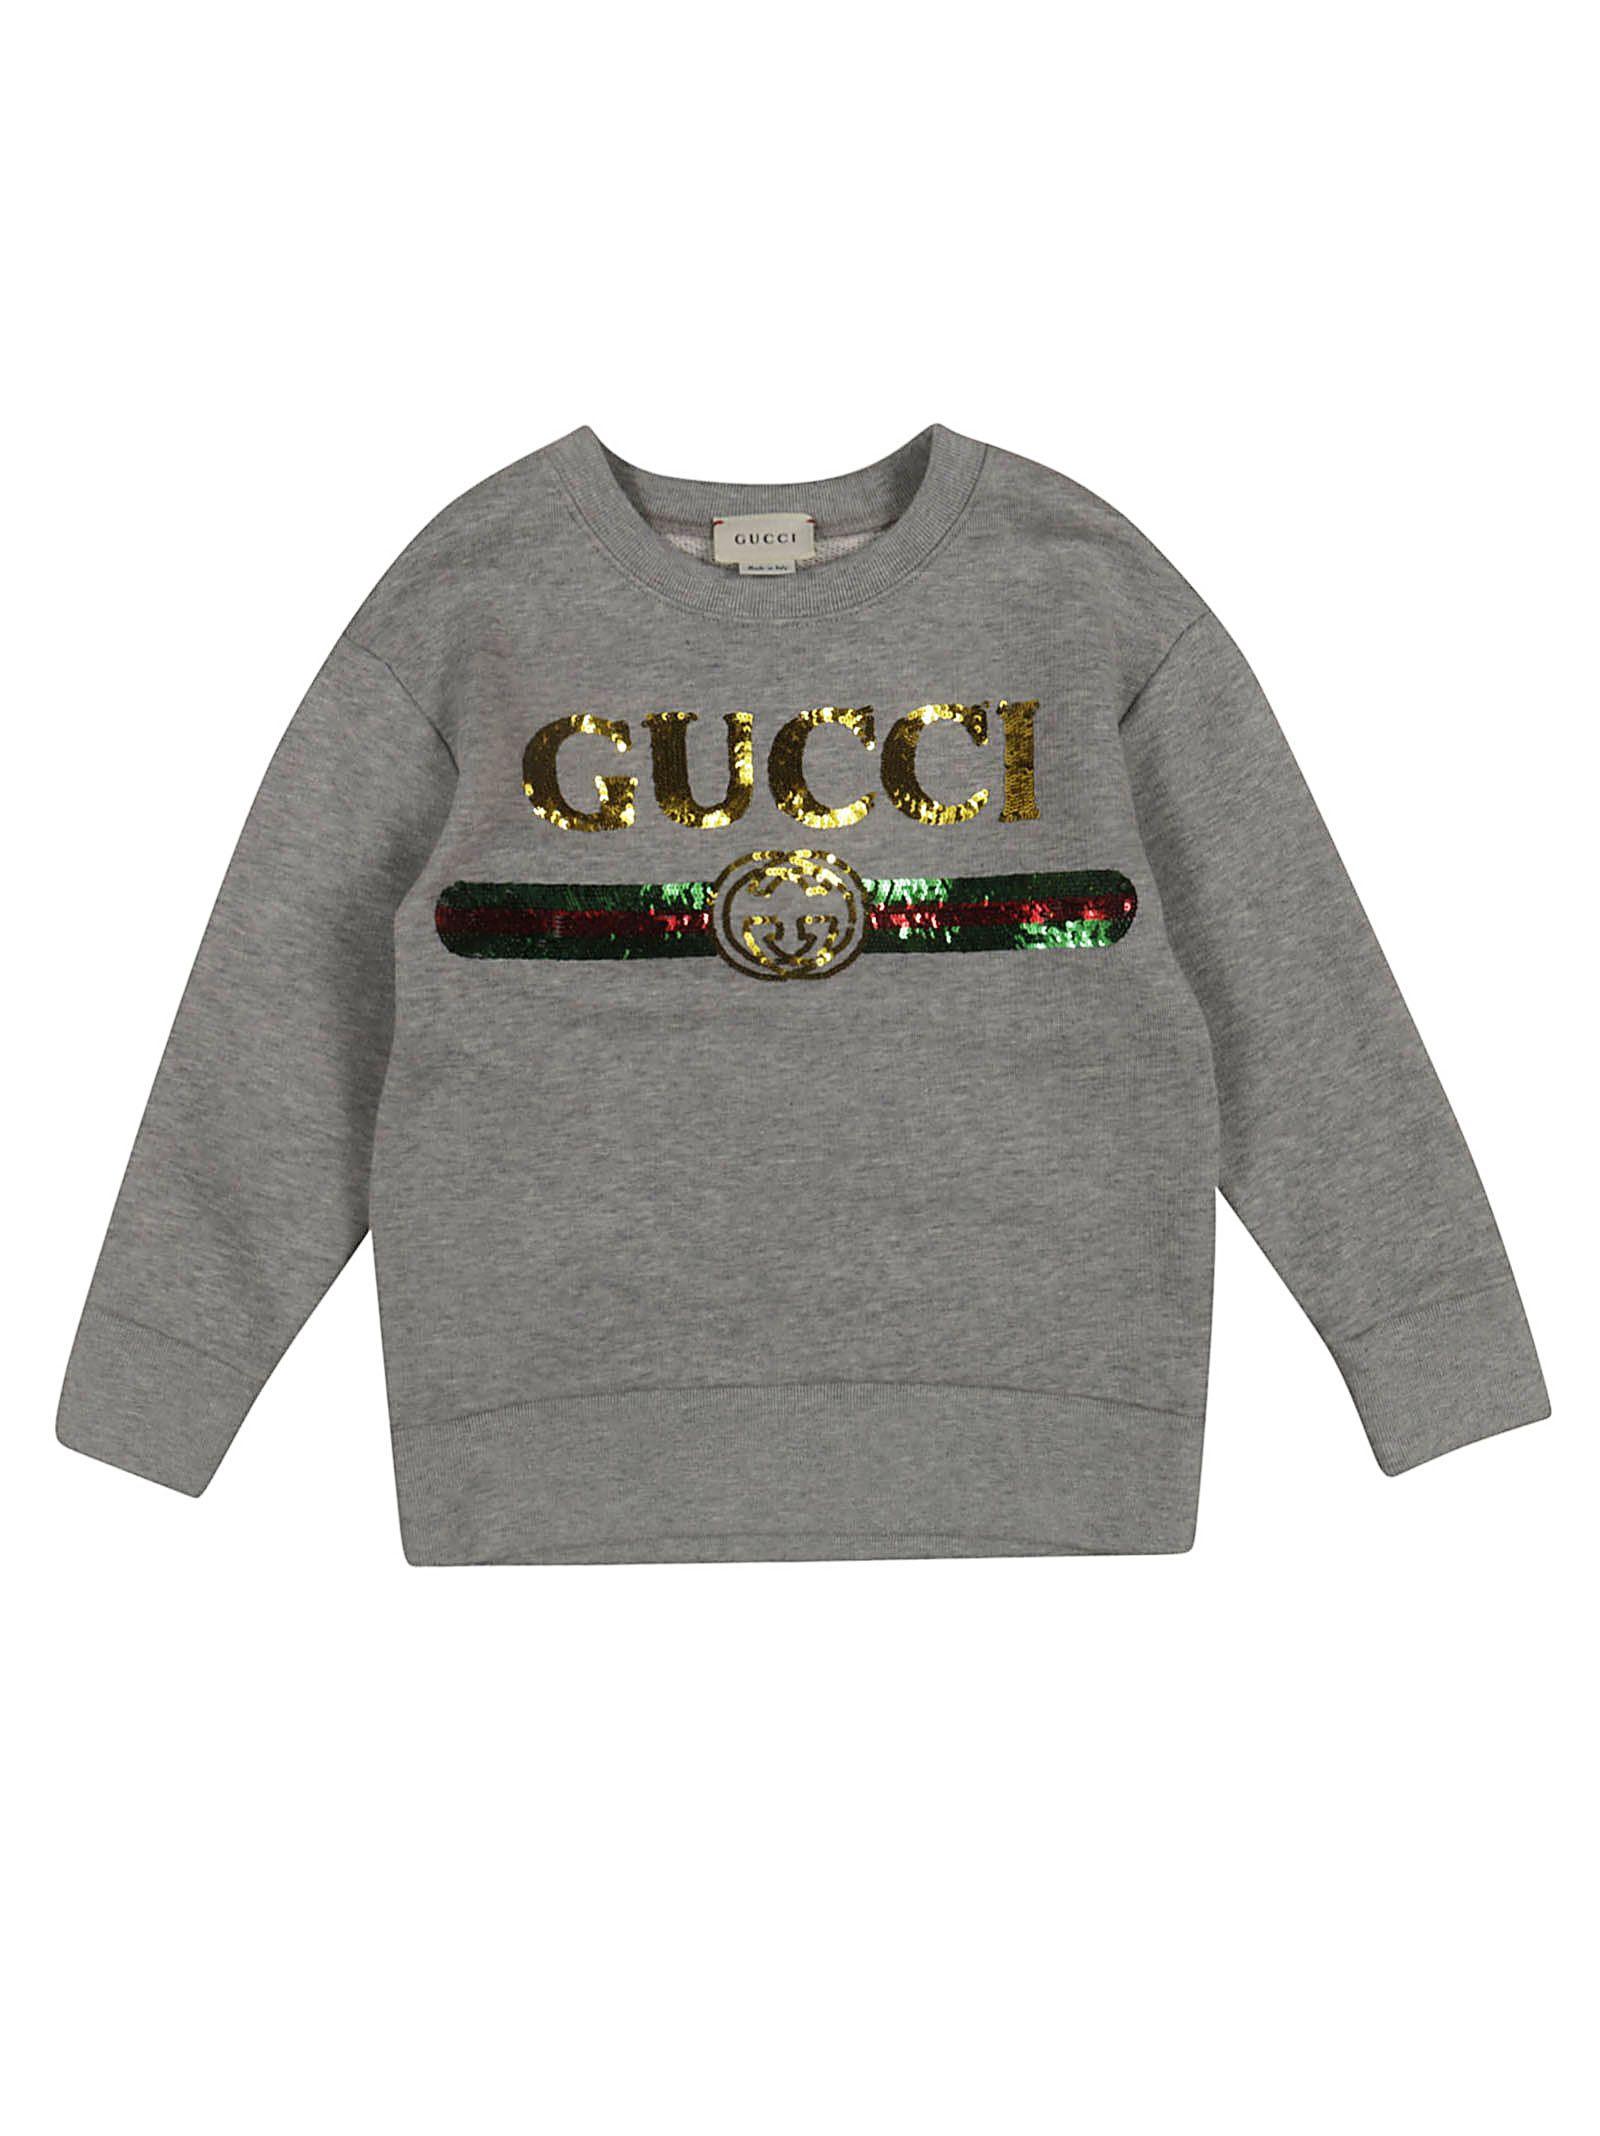 2485b1bb Gucci Gucci Sequin Logo Sweatshirt - Grey - 10920887 | italist